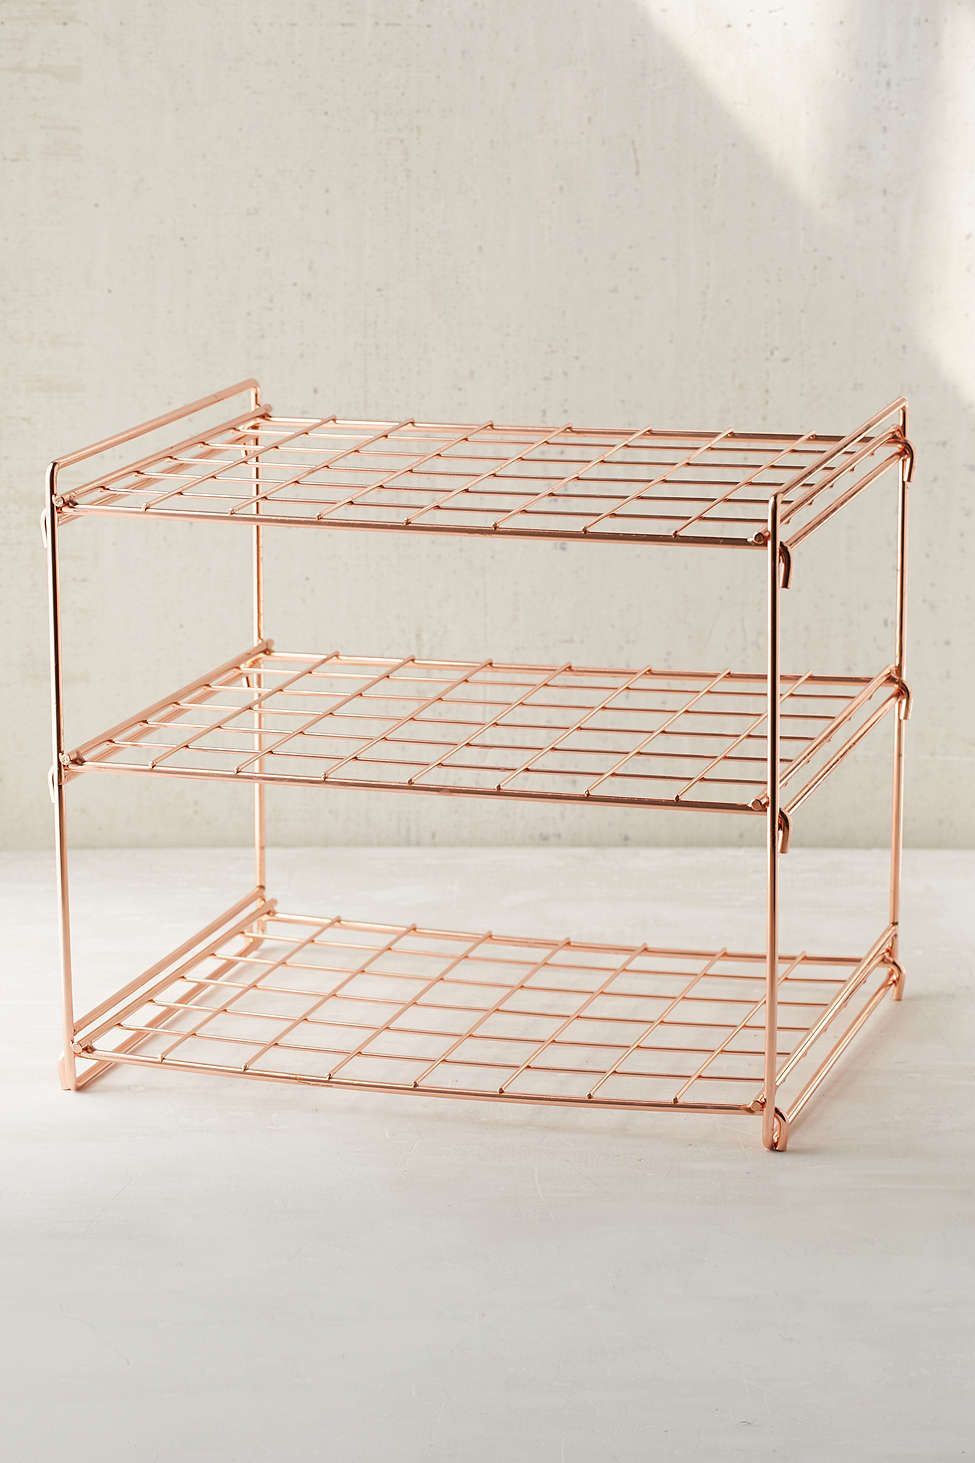 Copper Wire Shelf | Pinterest | Copper wire and Shelves